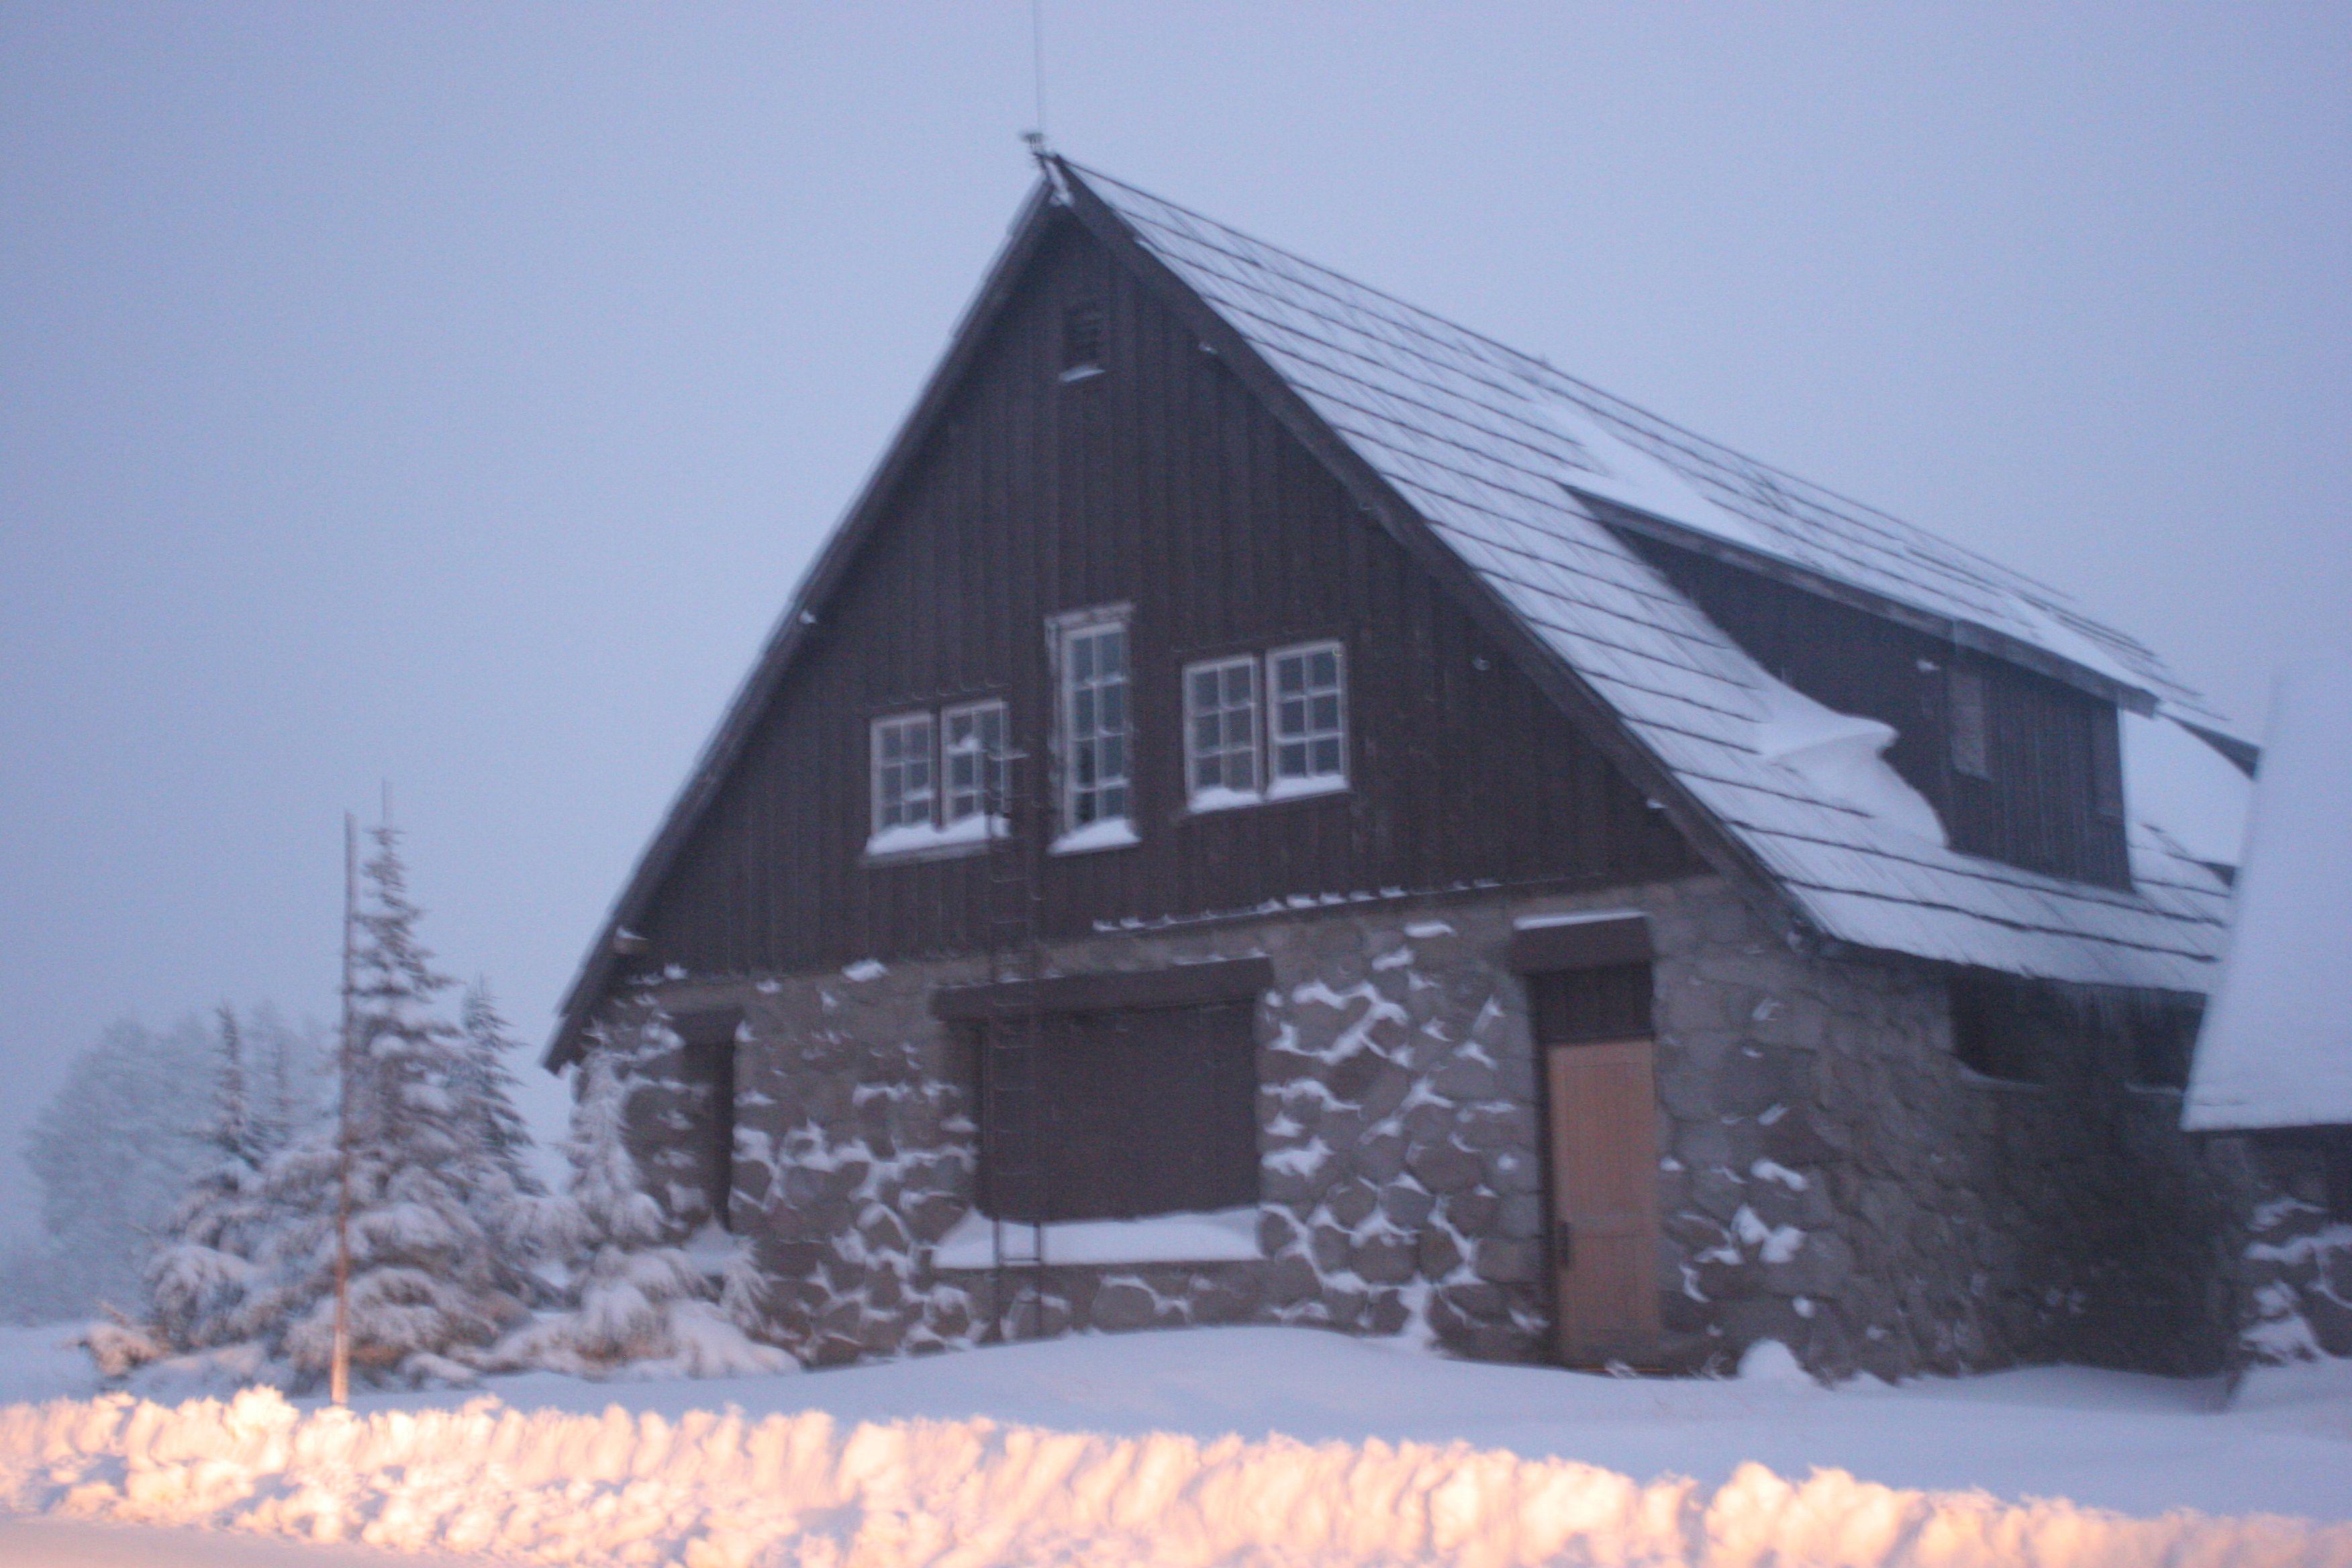 Crater Lake lodge ... off-season